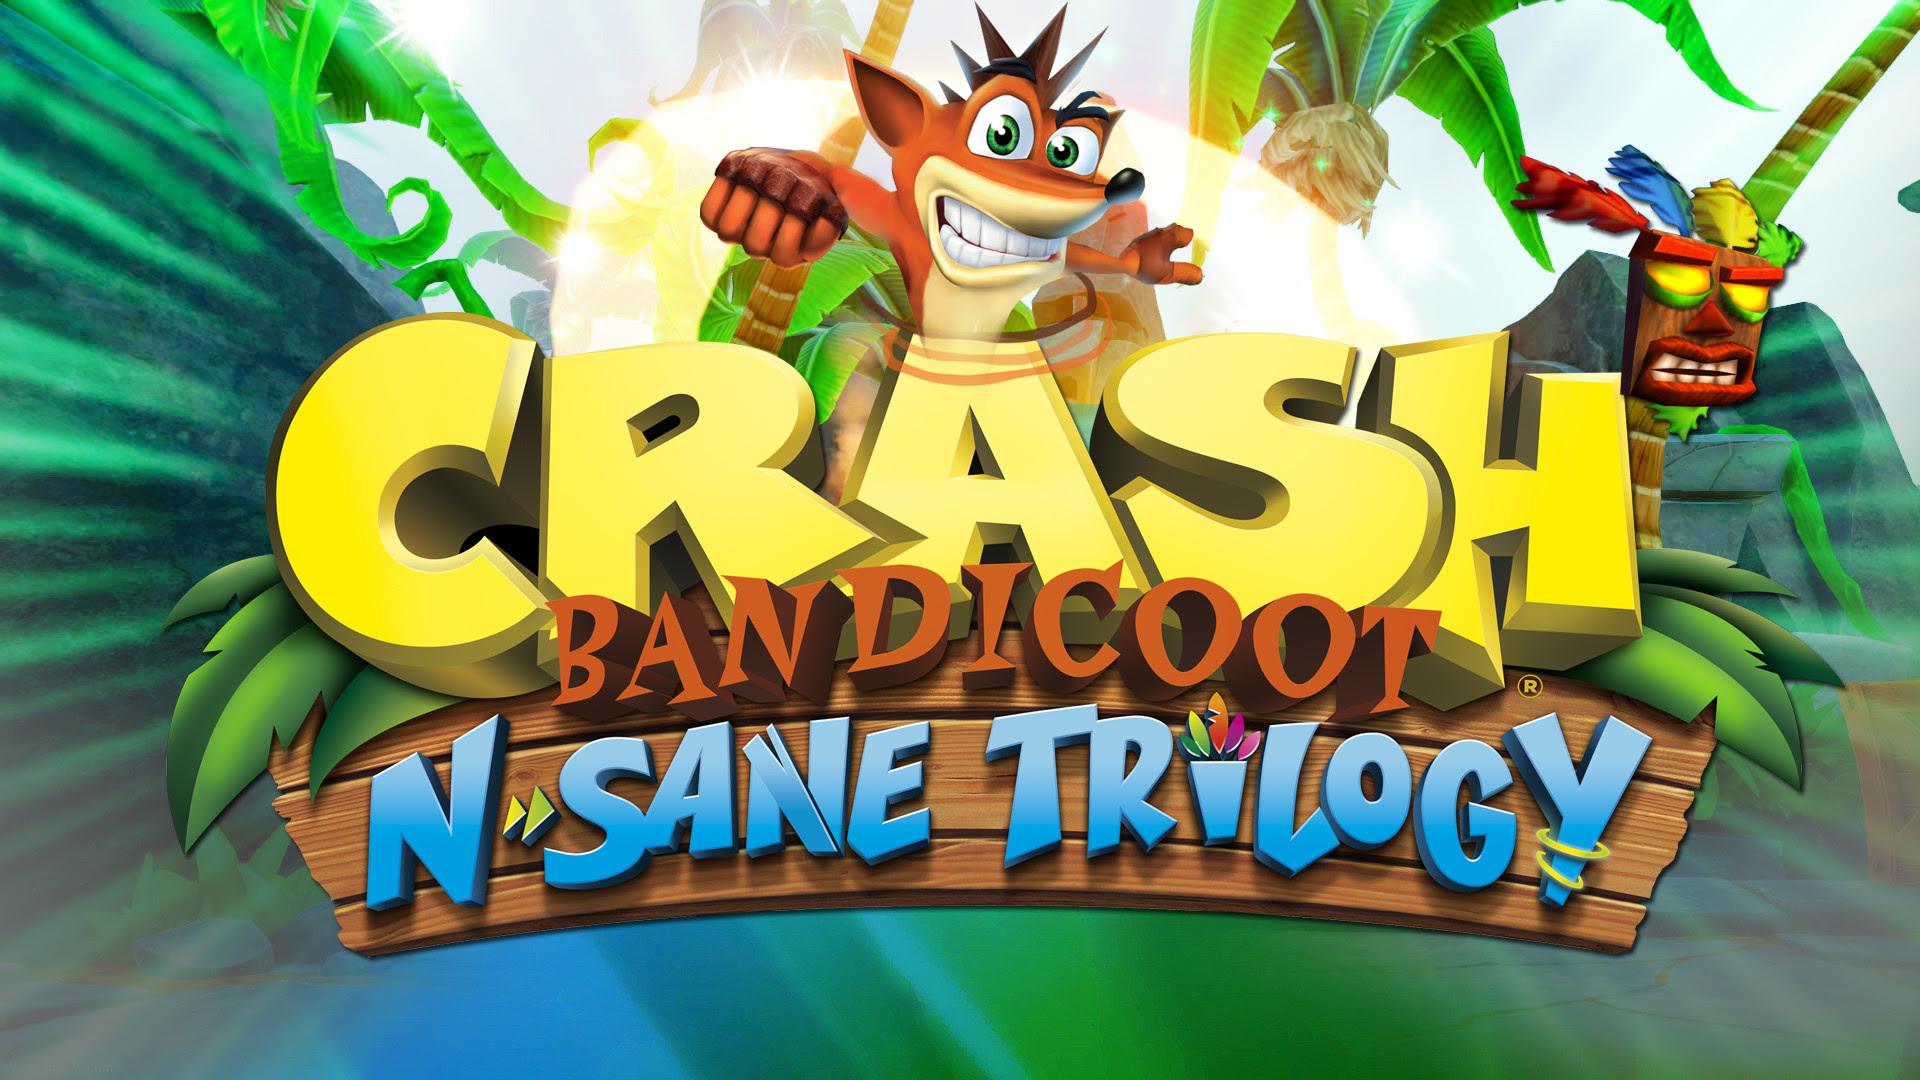 Crash Bandicoot Wallpapers 67 Images